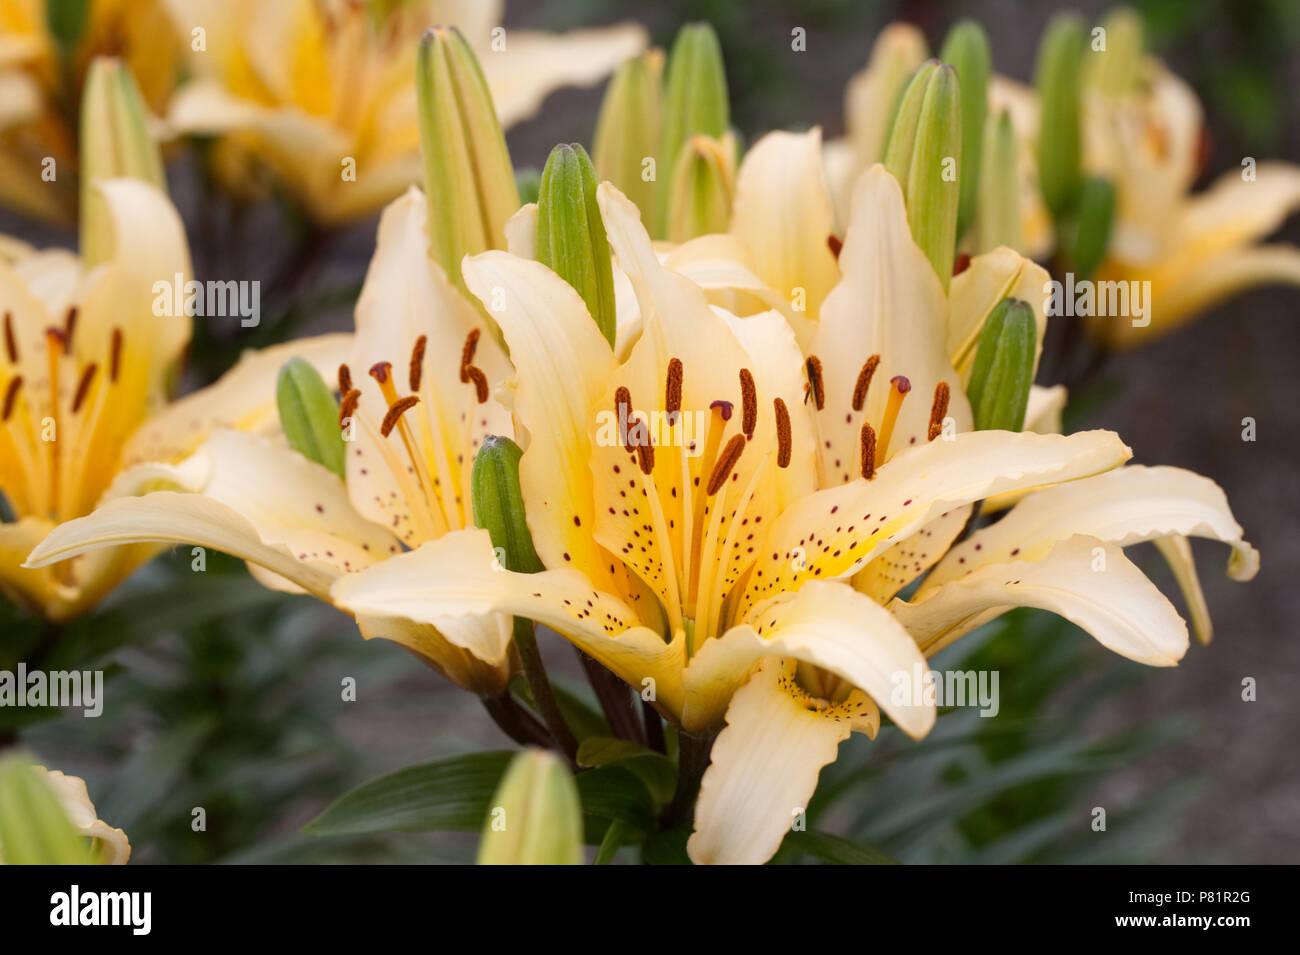 Lilium 'Freckled Joy' flowers. - Stock Image